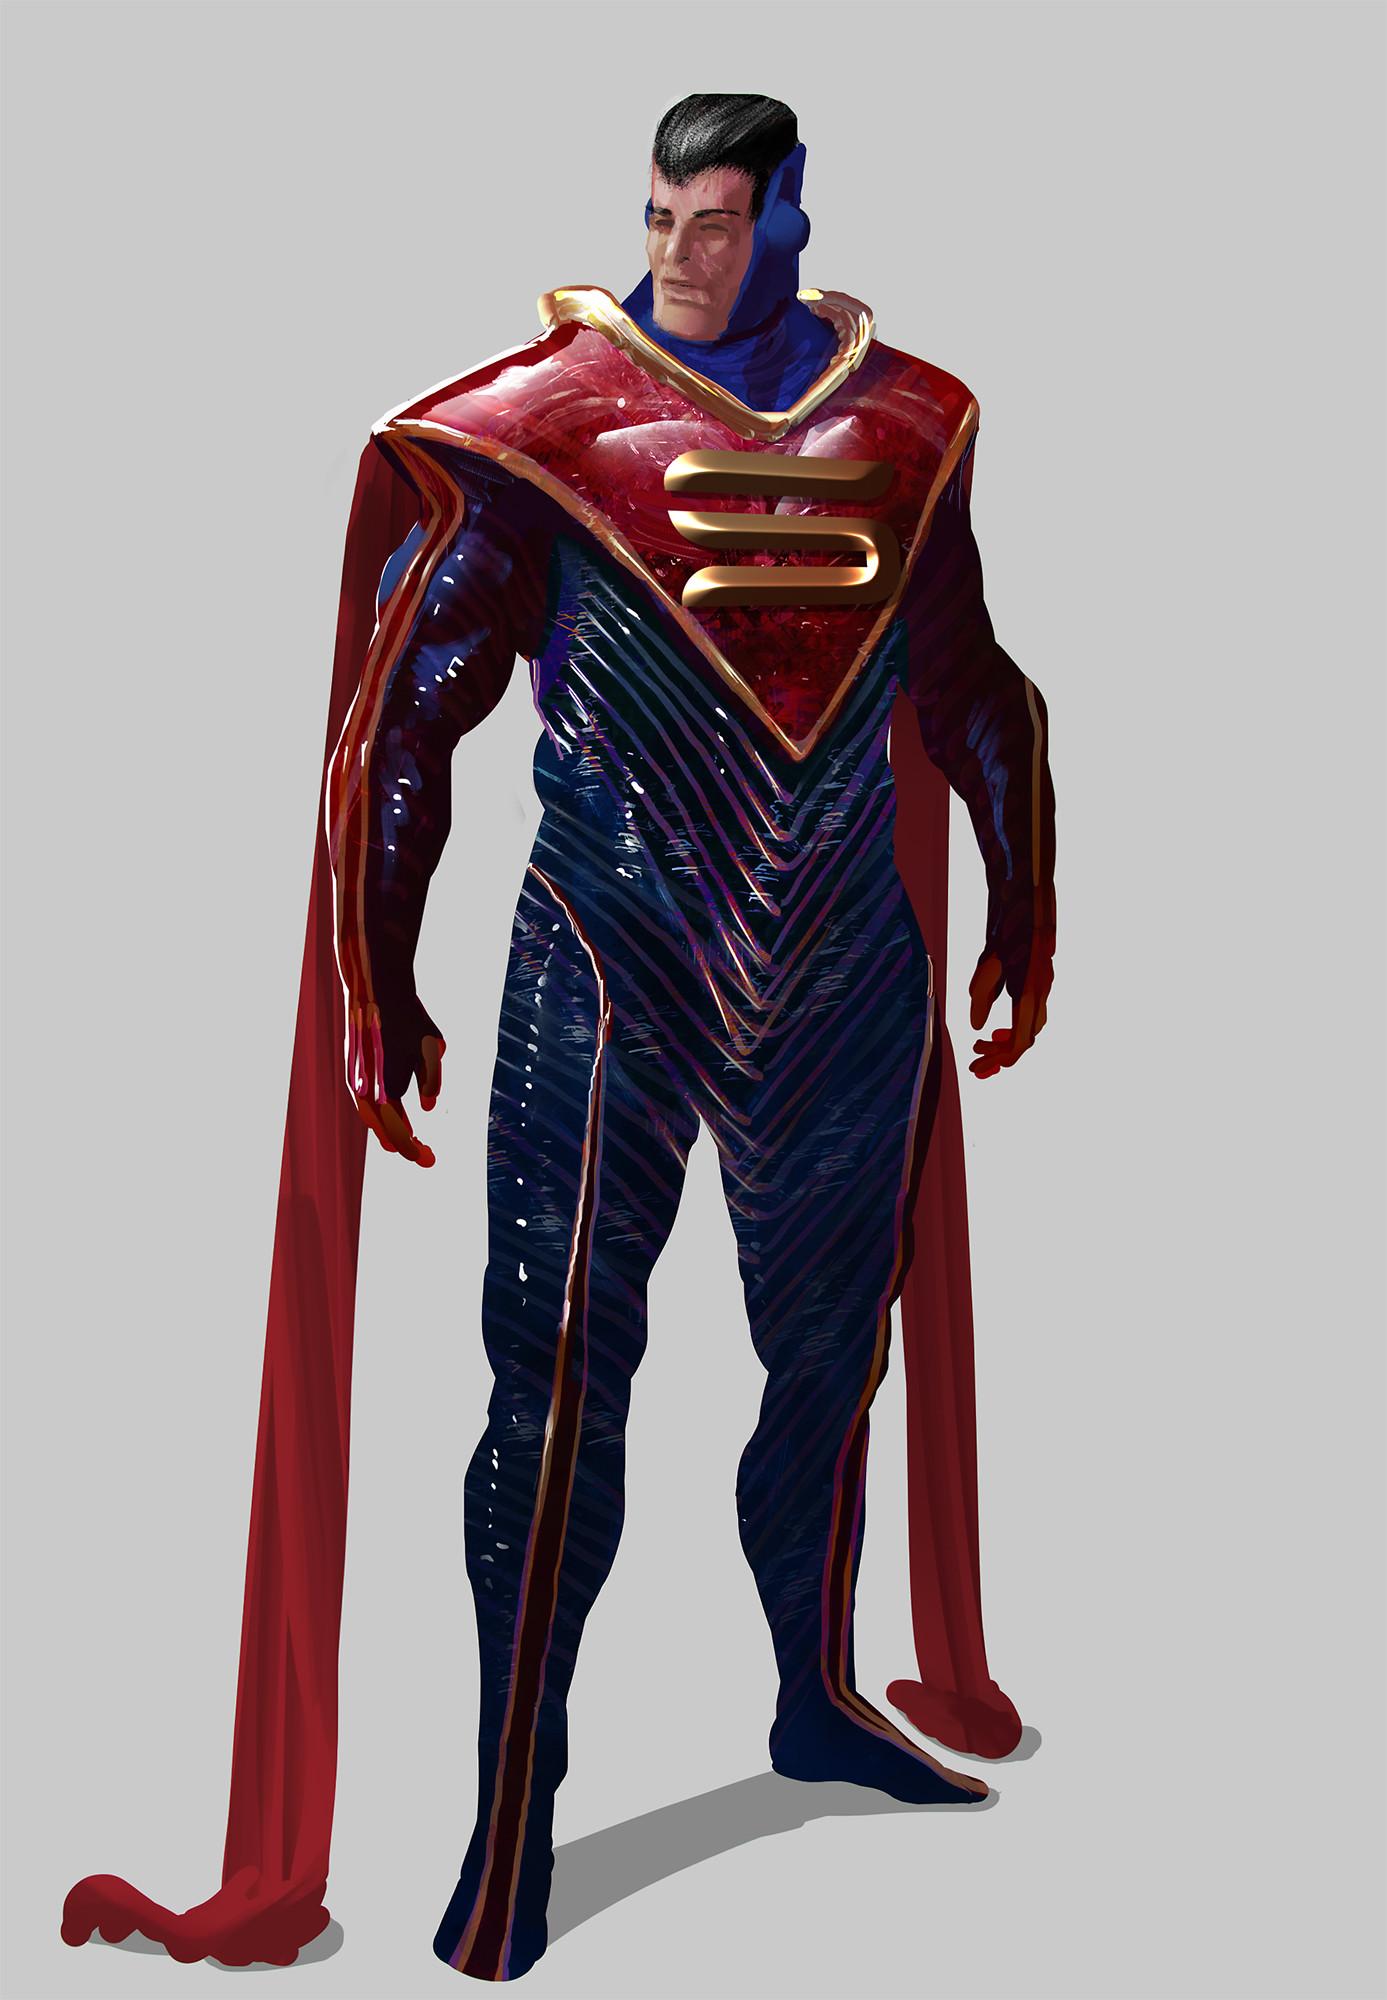 Chenthooran nambiarooran superman2 aether